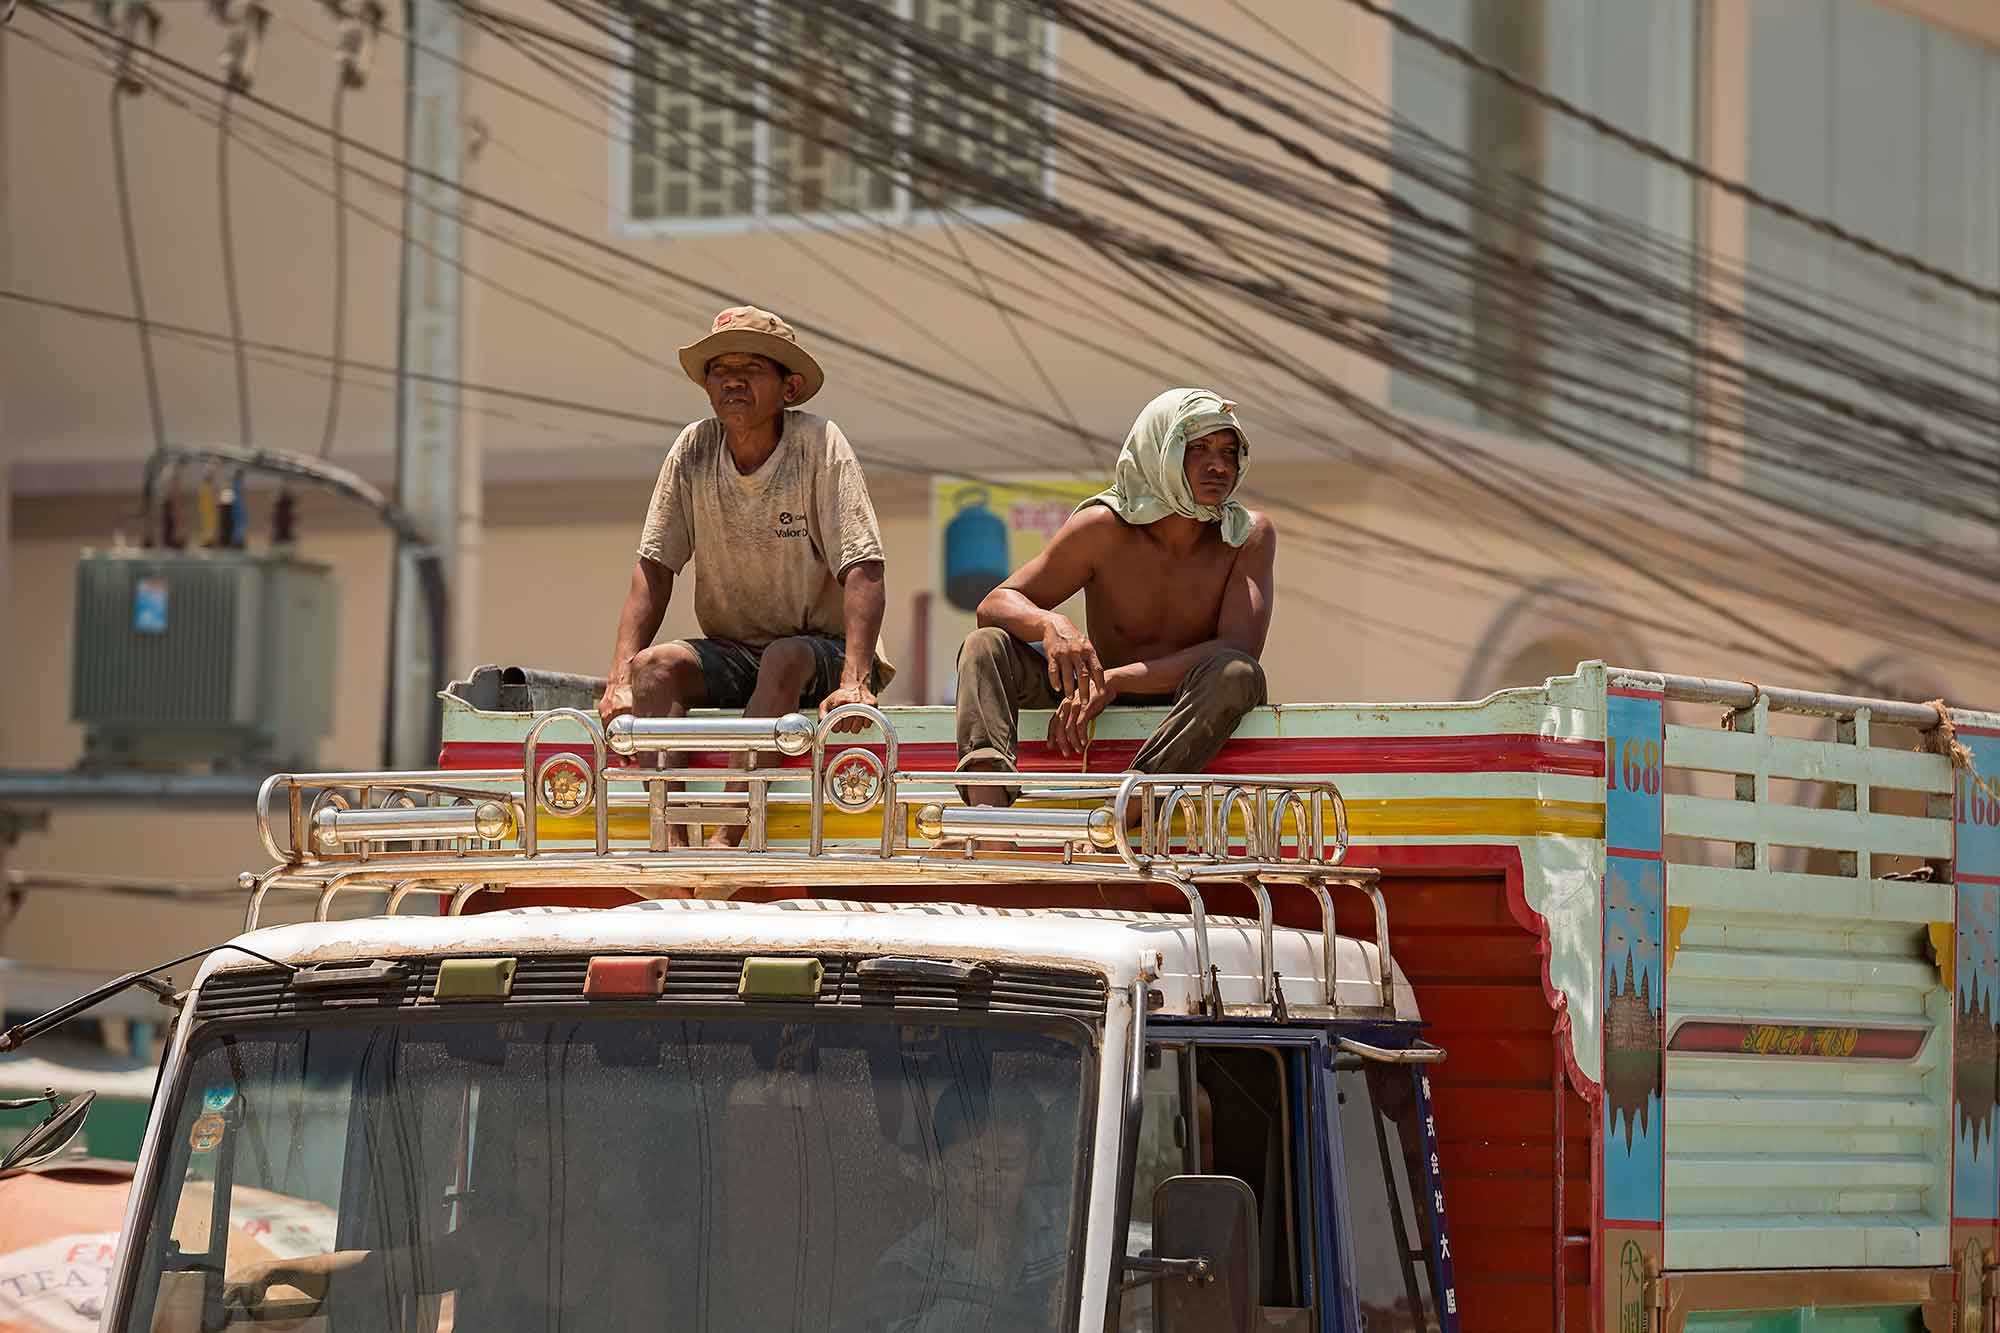 Trucking in Cambodia. © Ulli Maier & Nisa Maier